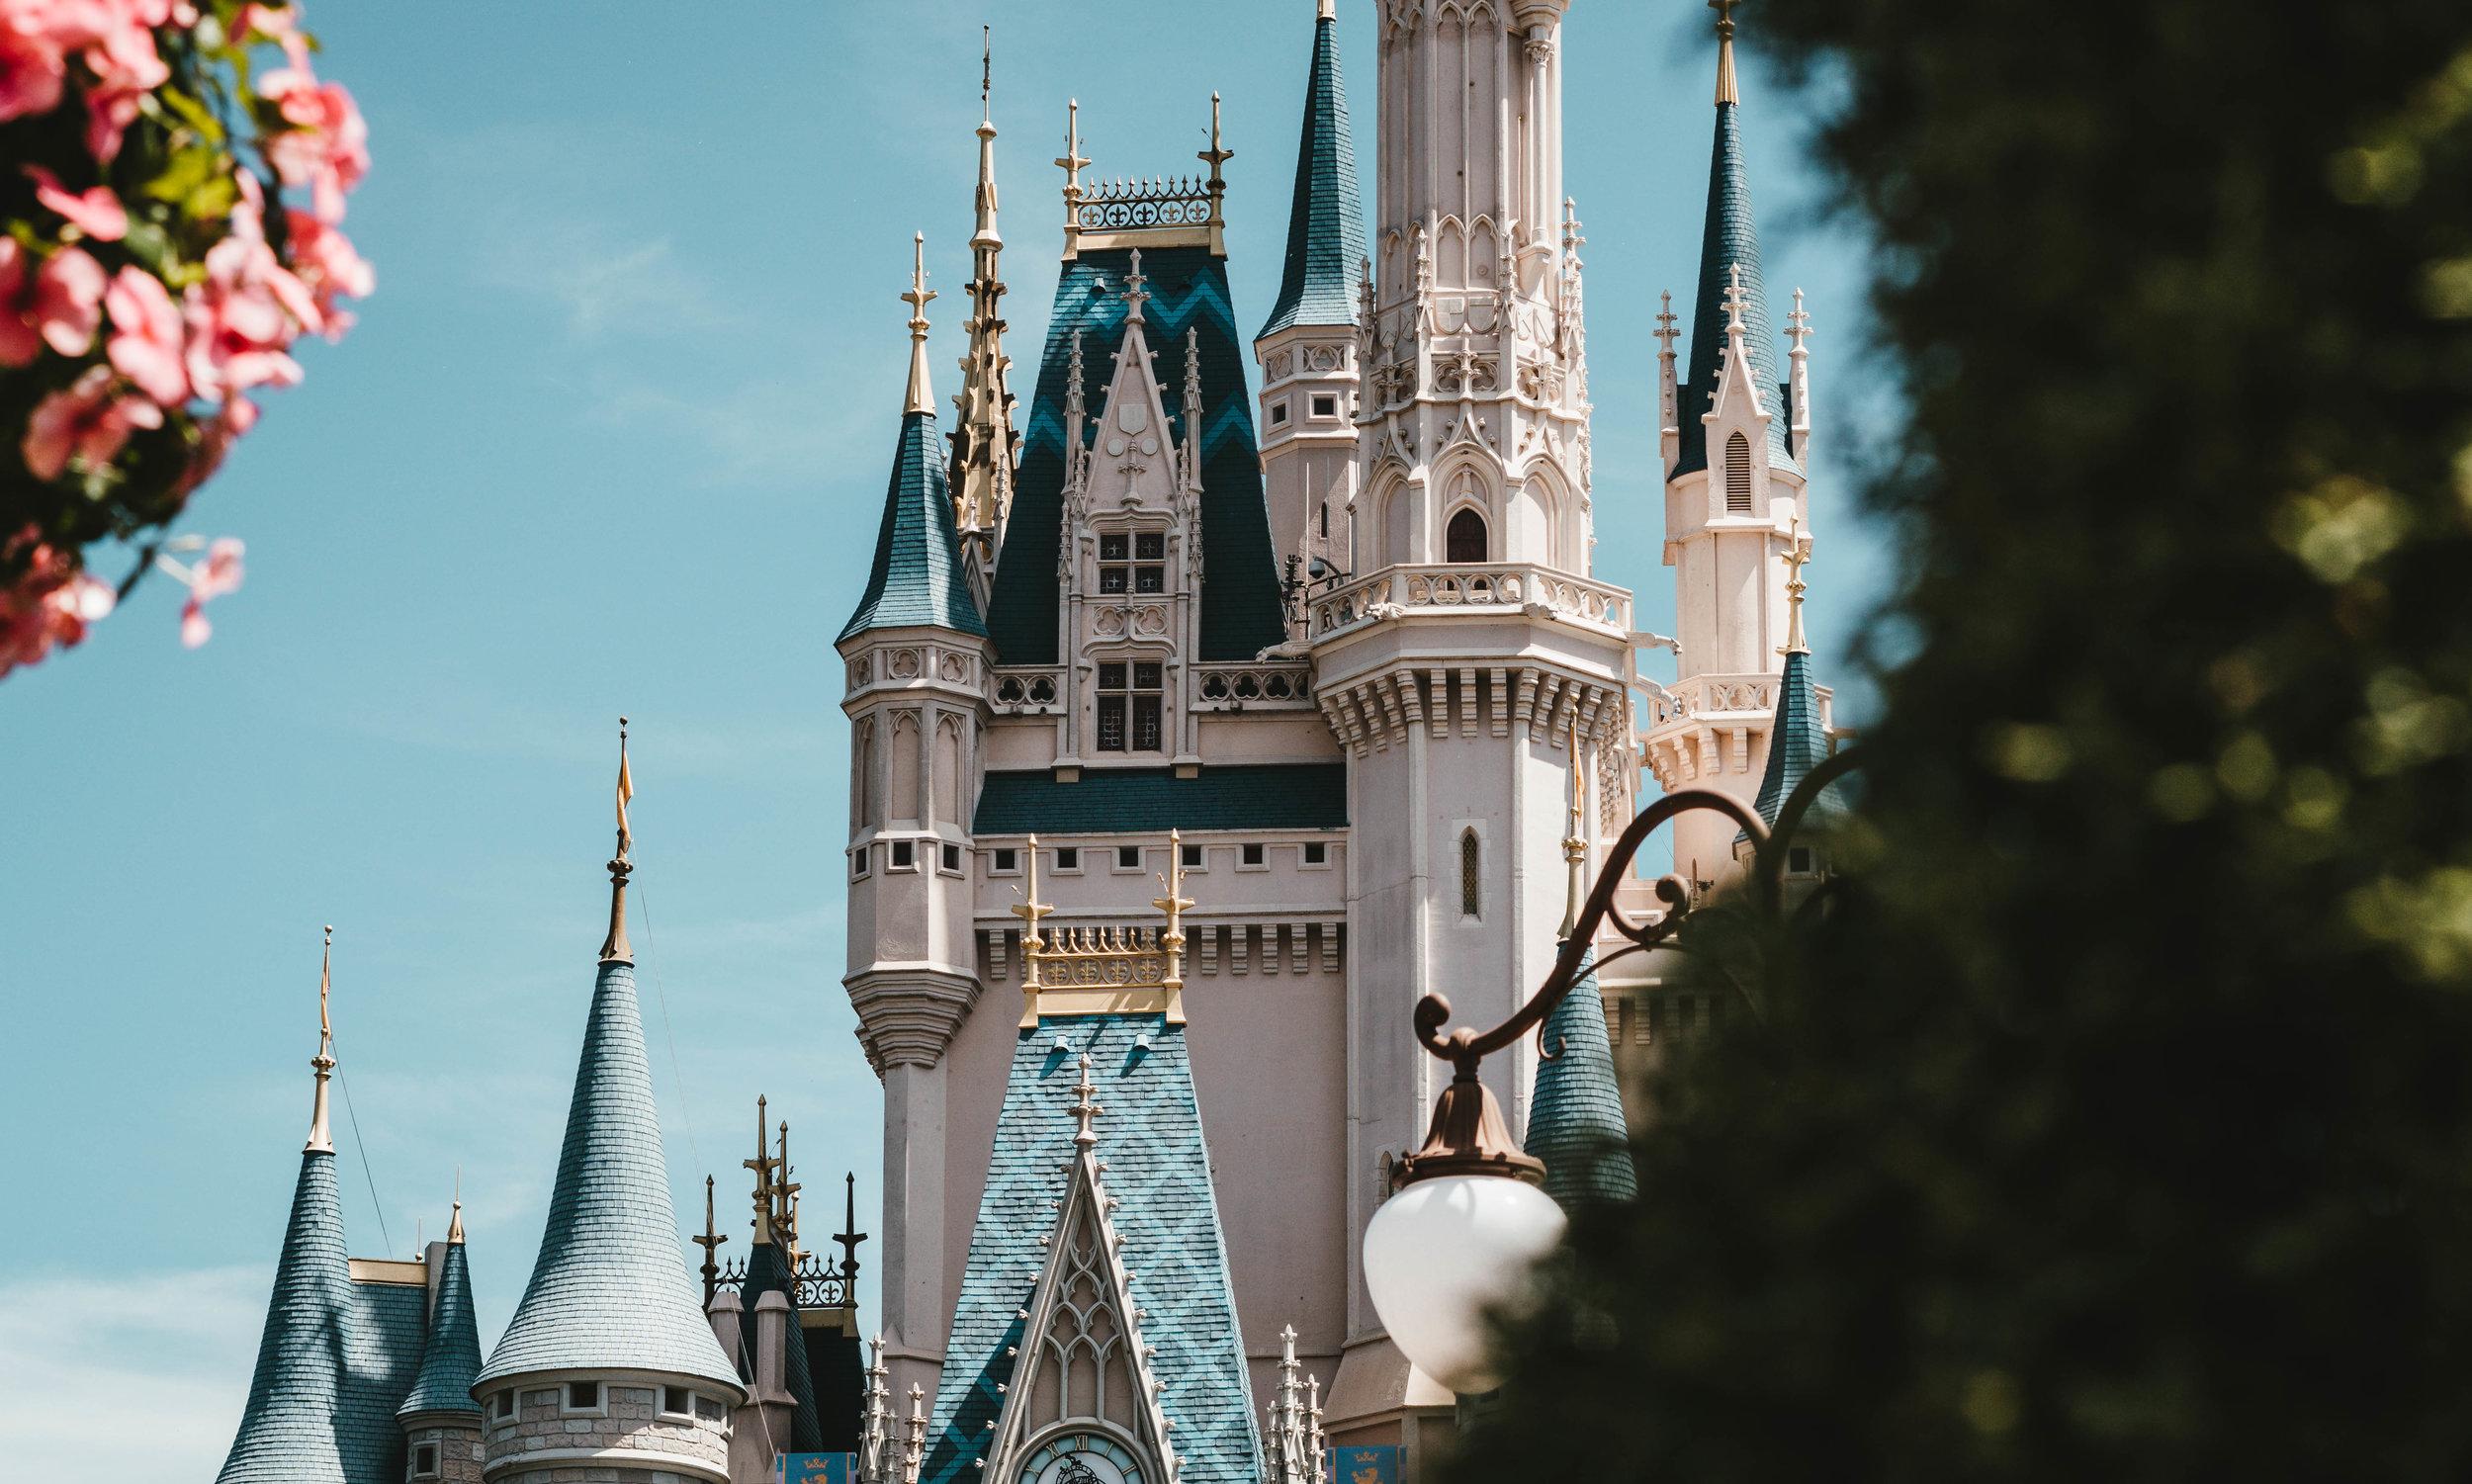 Walt Disney World, Orlando, Florida, USA